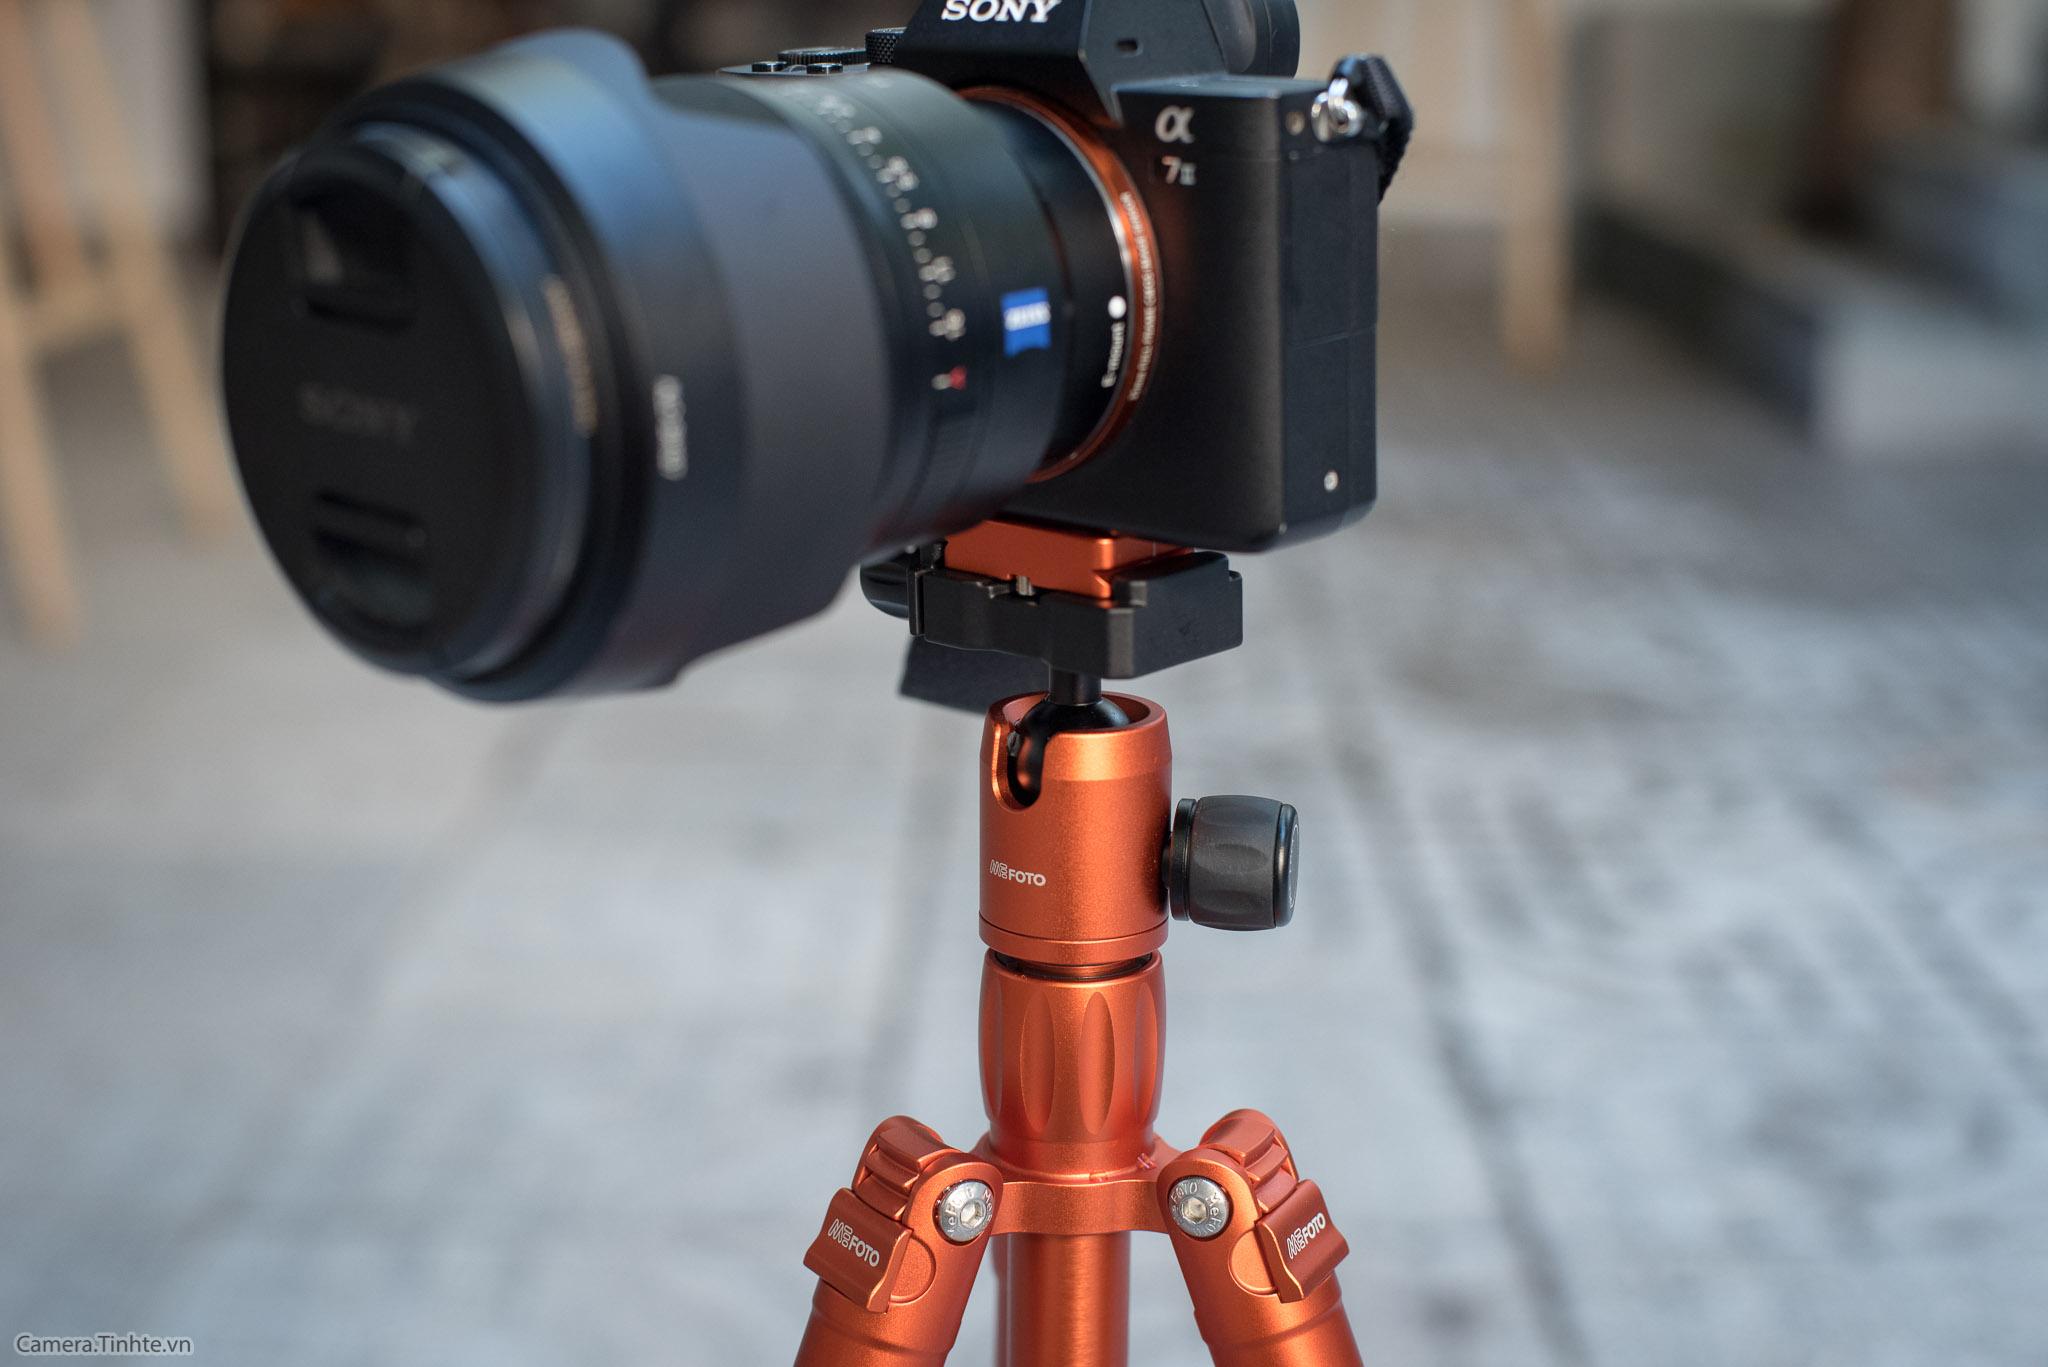 Tren tay tripod Mefoto Backpacker AIR - Camera.tinhte.vn-17.jpg